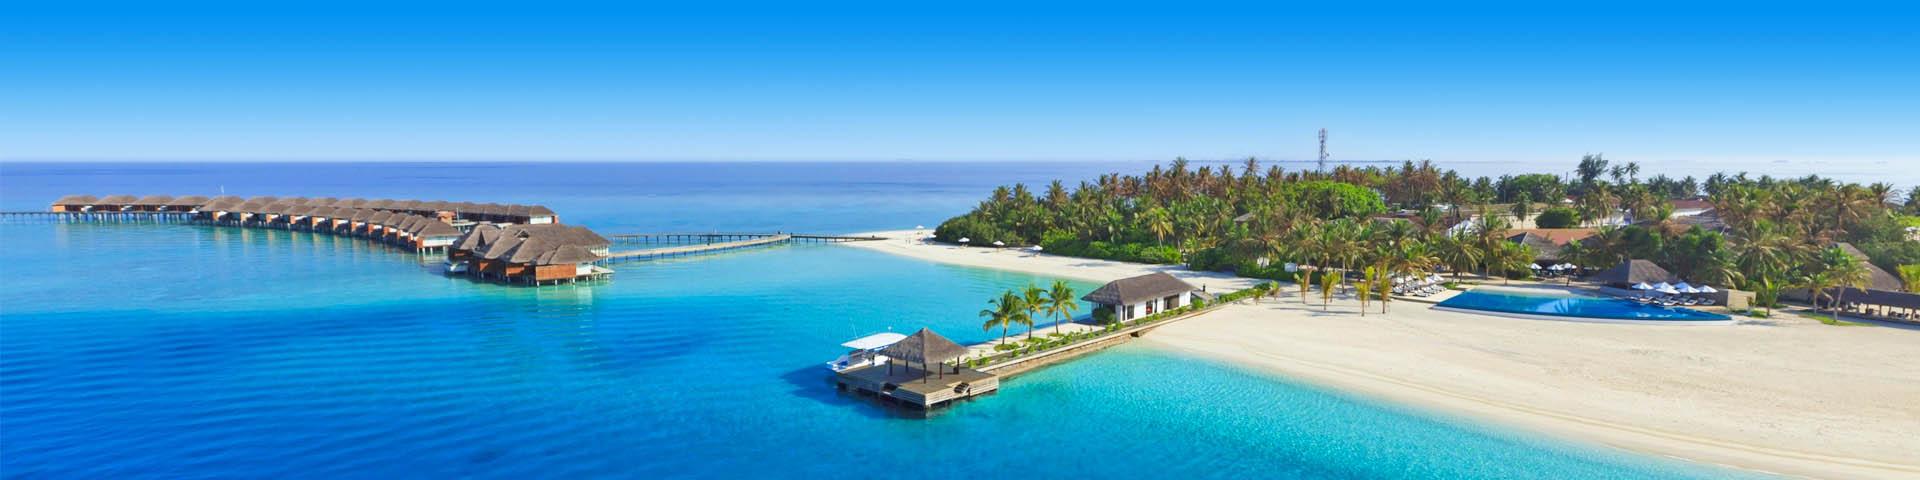 Strandresort op het strand omringd met blauwe zee